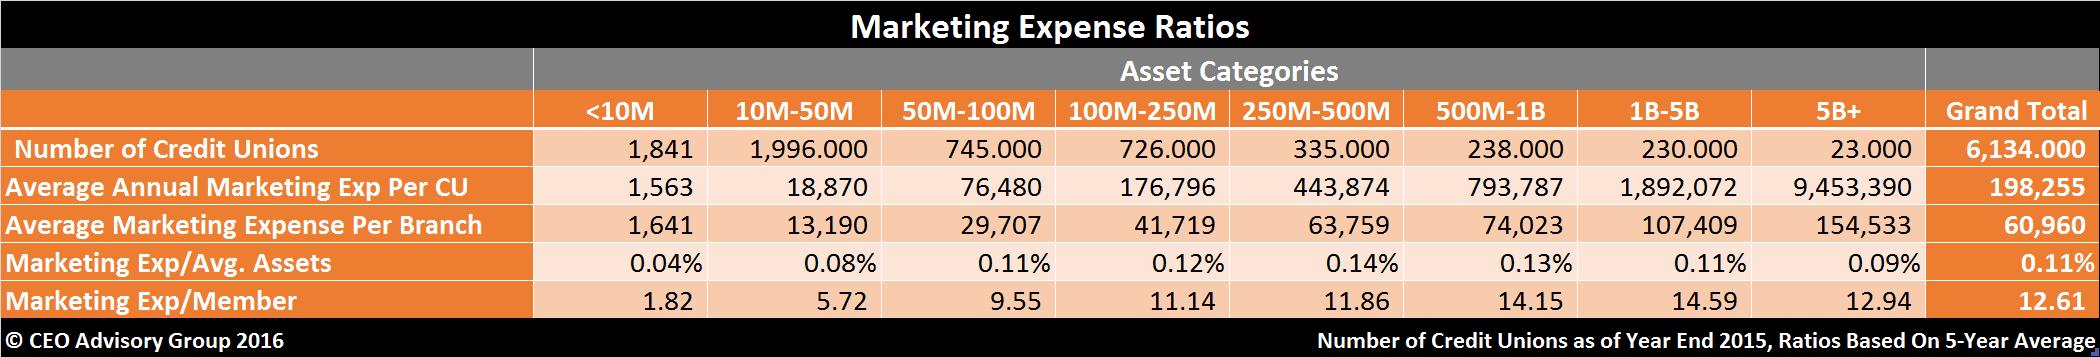 Credit-Union-Marketing-Ratios